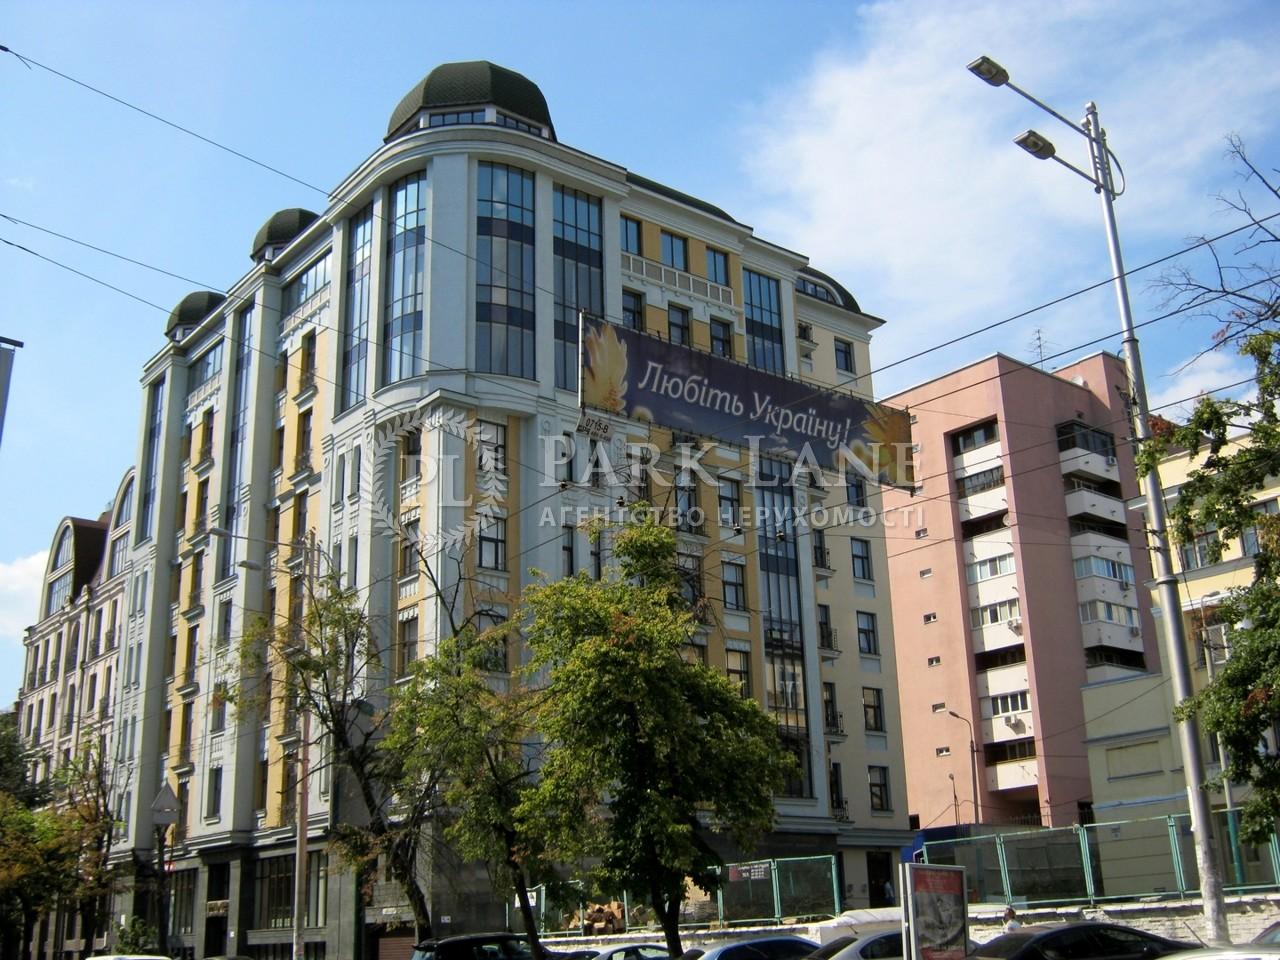 Бизнес-центр, ул. Жилянская, Киев, B-100033 - Фото 1